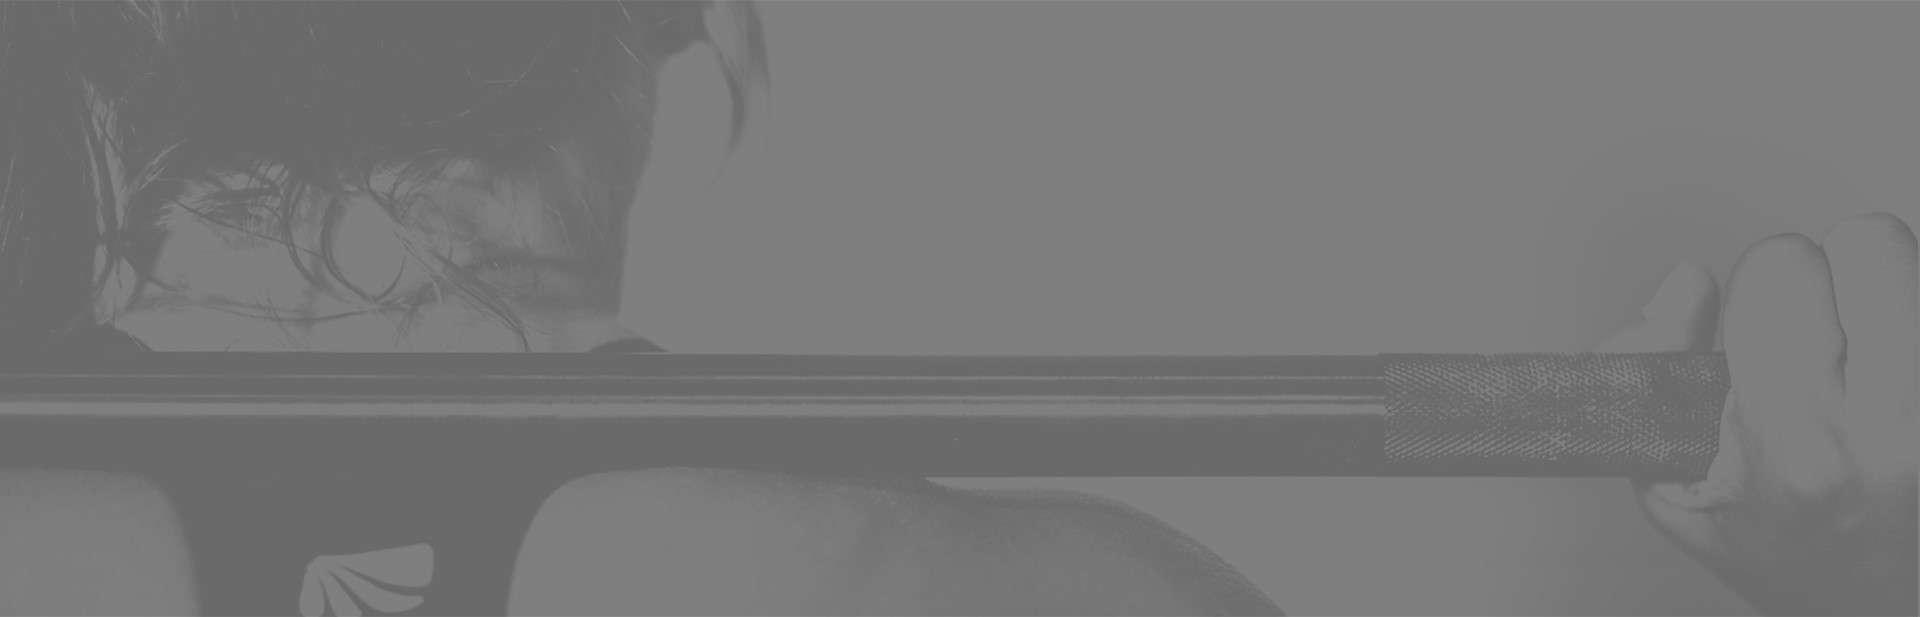 Stadline - Visuel sportive gris